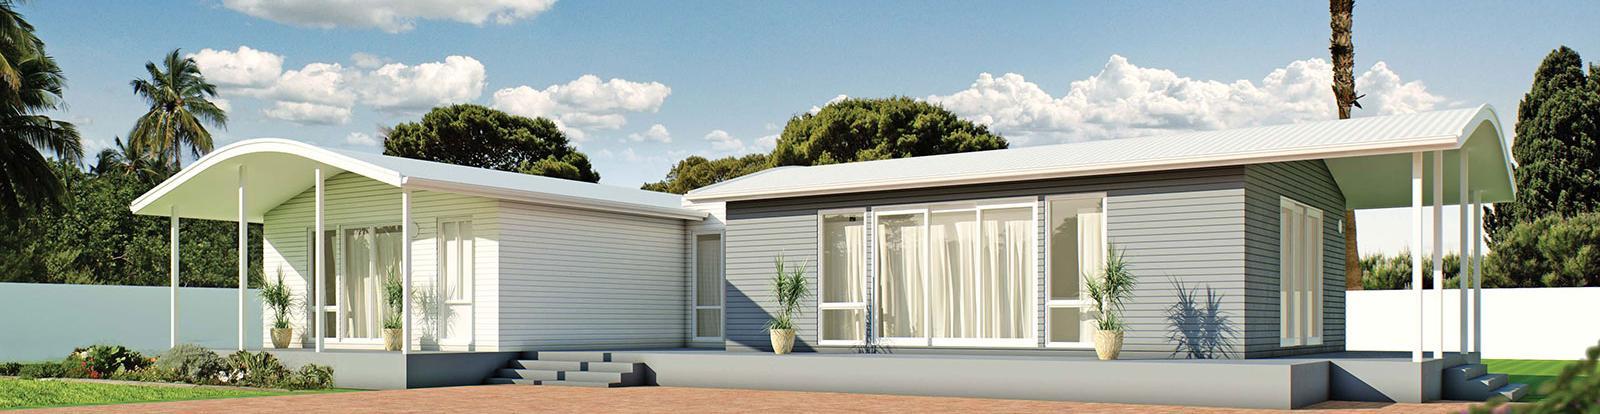 Systembuilt Home Designs